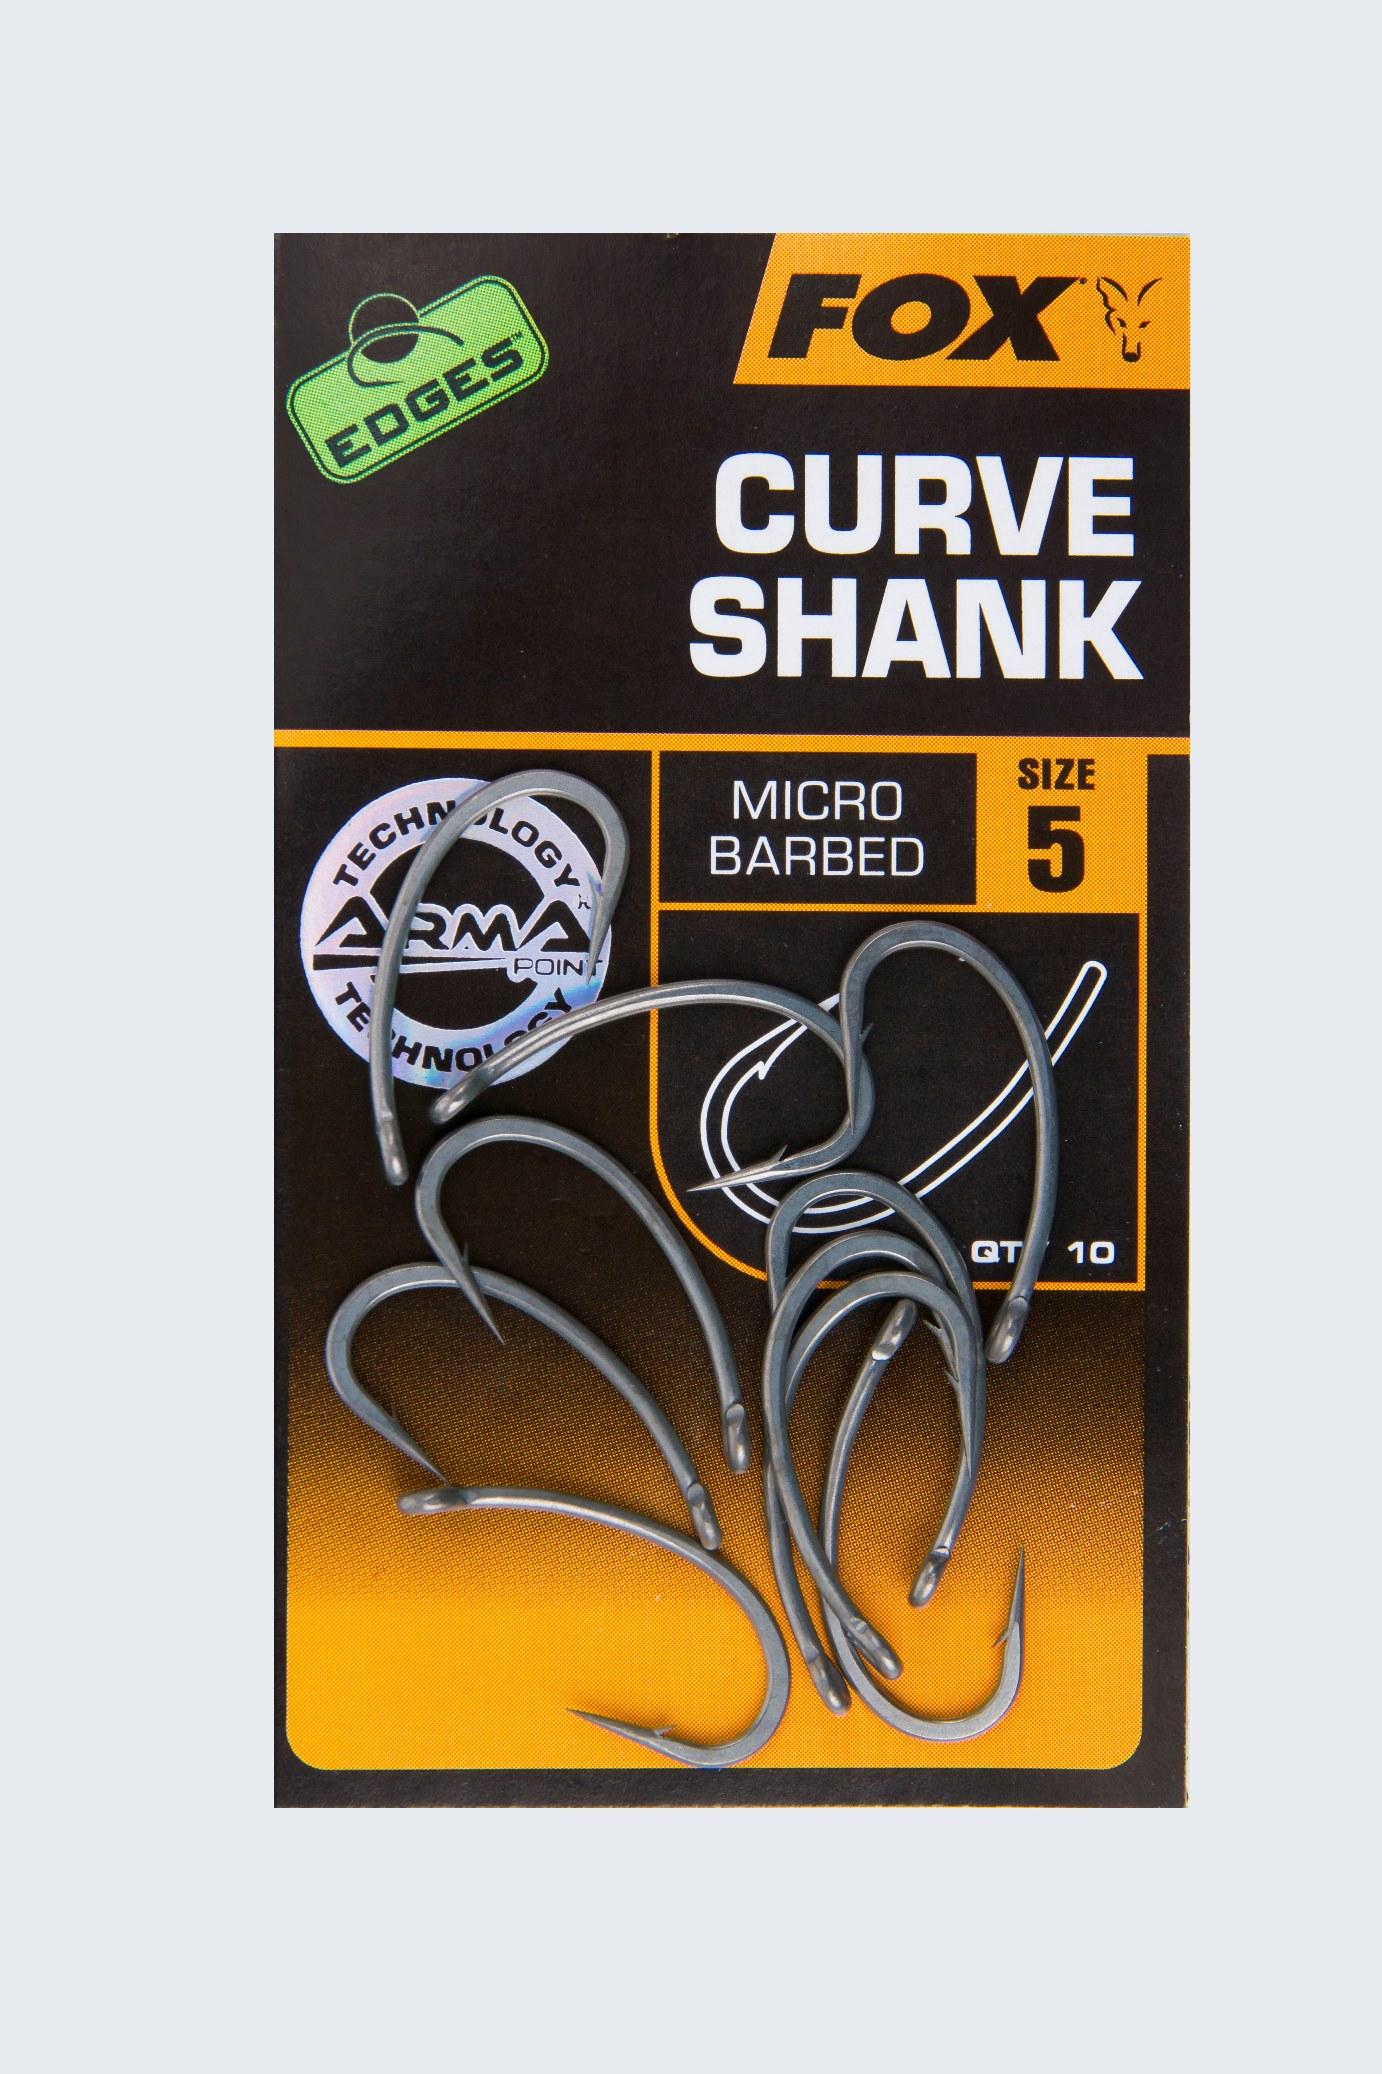 Fox-Edges-Hooks-Curve-Shank-Micro-Barbed-Hook-10-Haken-Gr-2-4-5-6-7-8-Armapoint